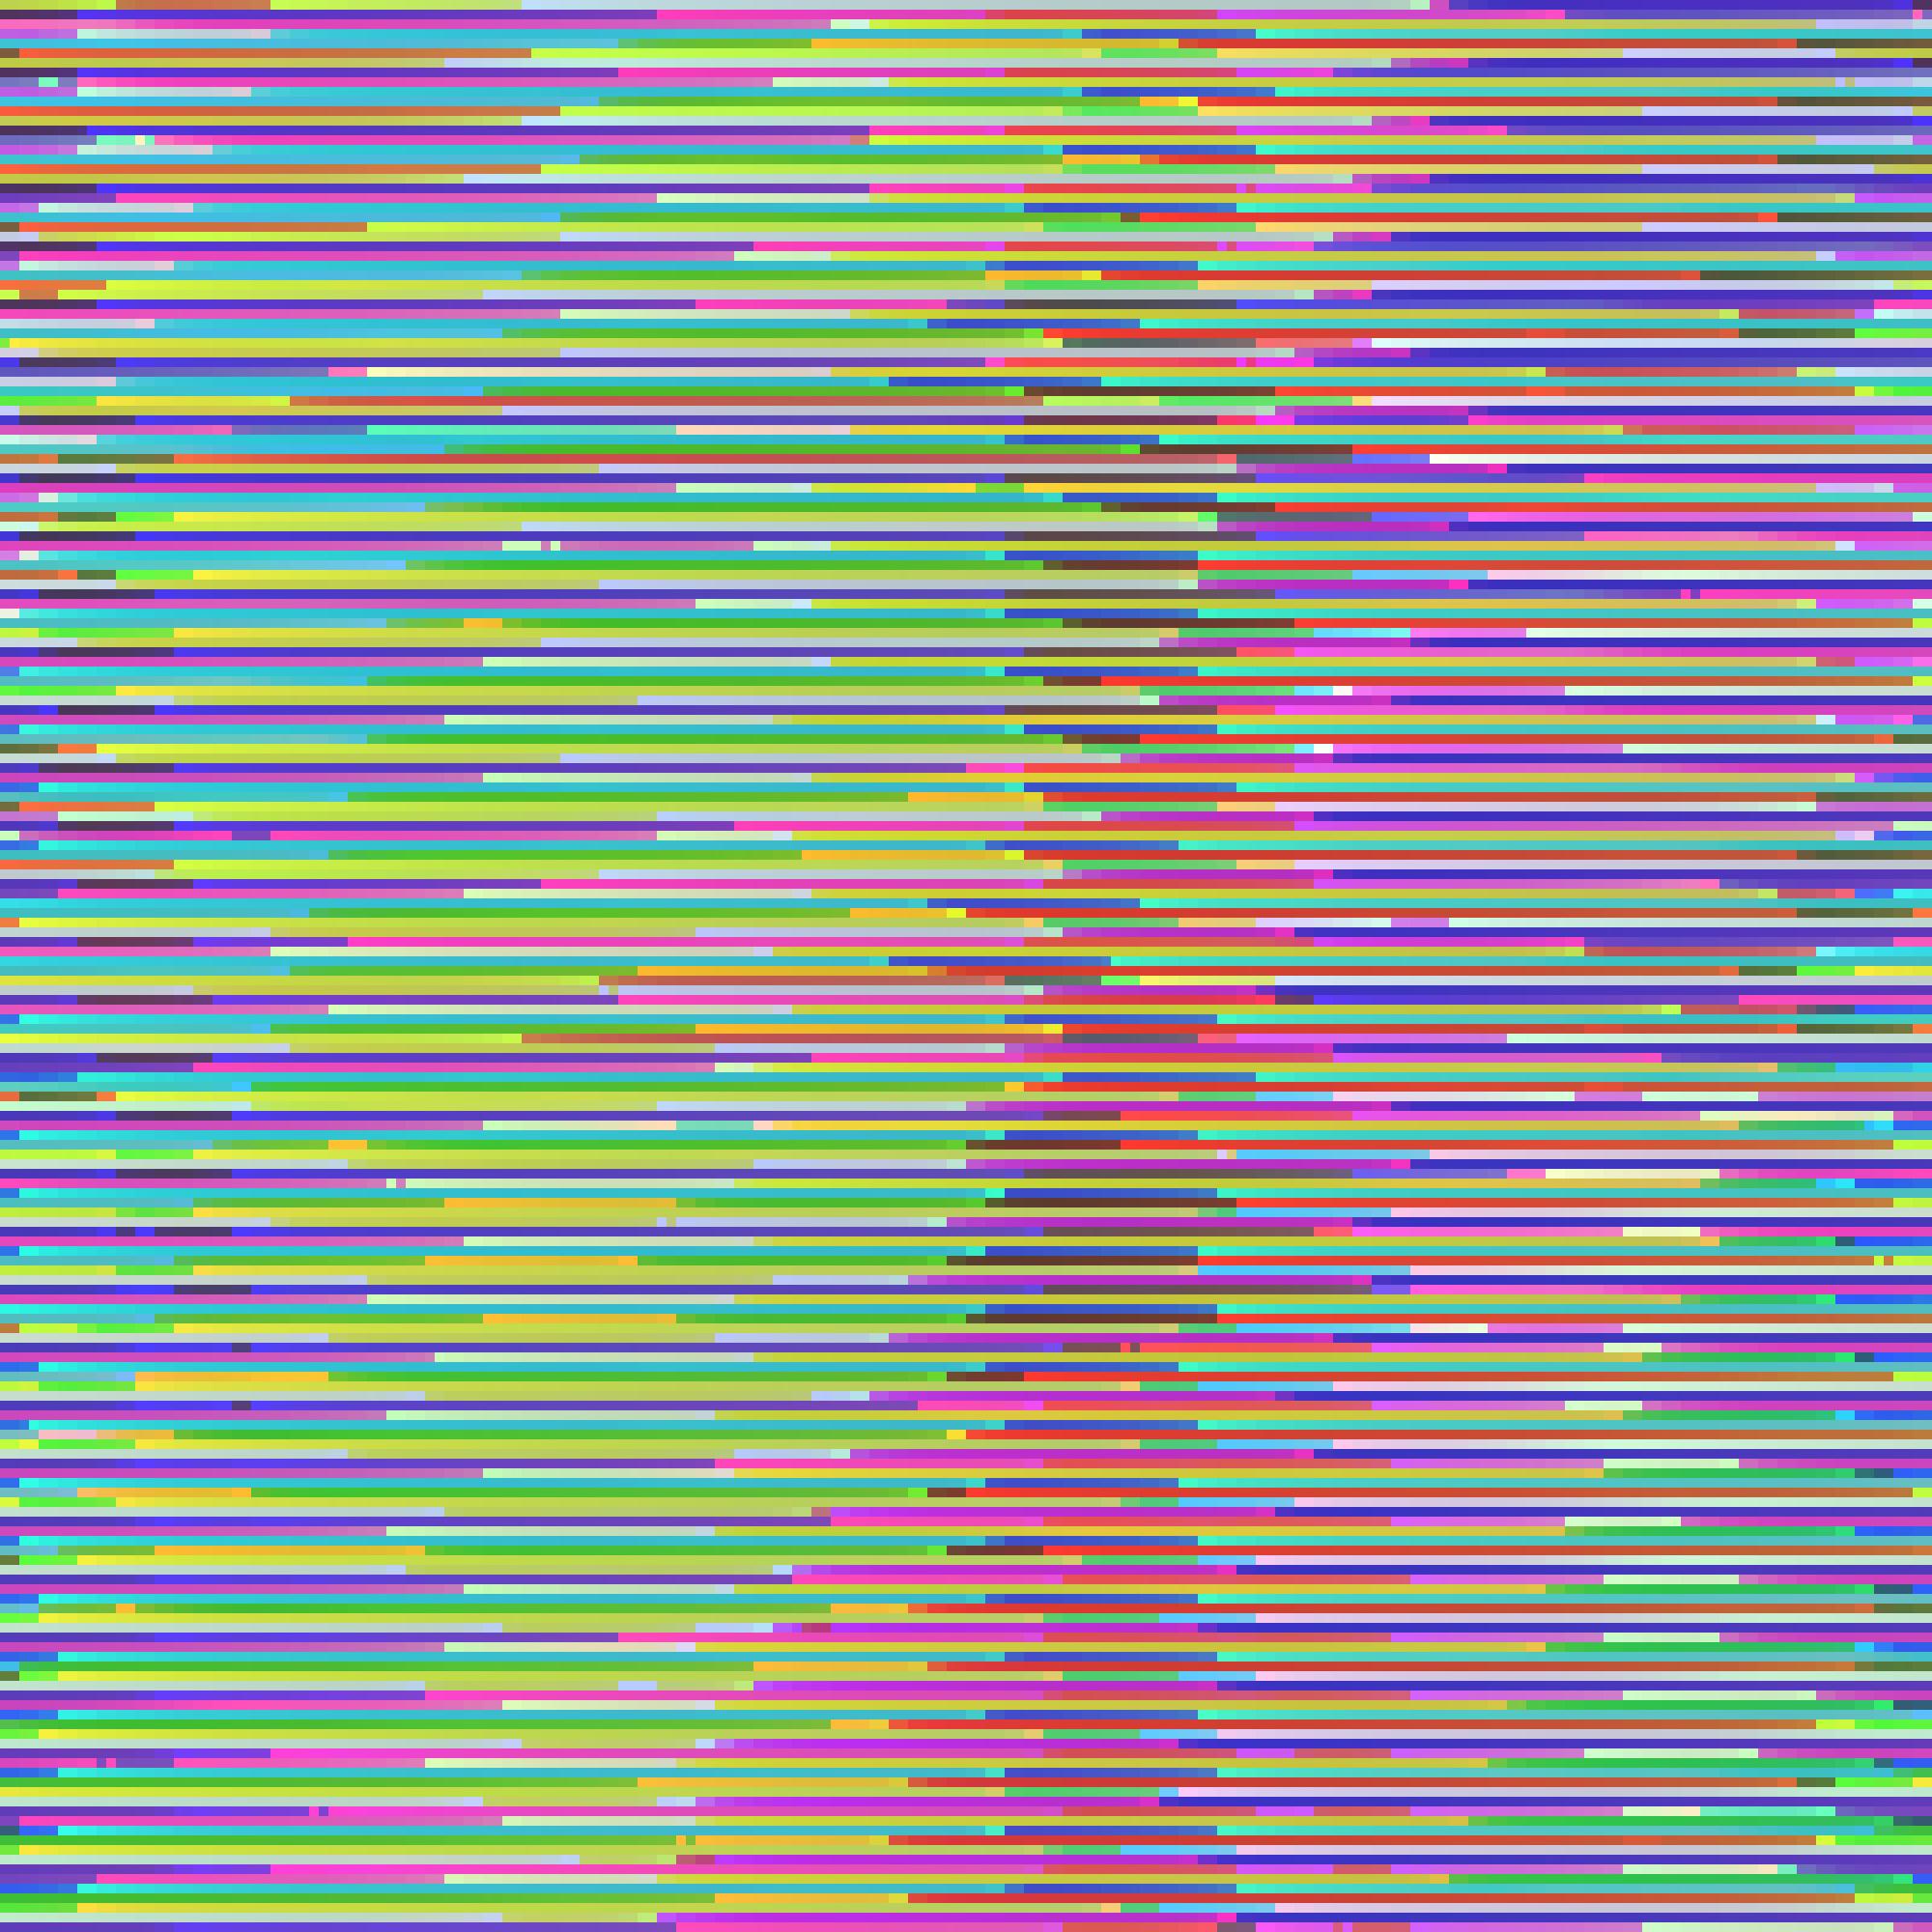 synthesized laser sound  14 sec.